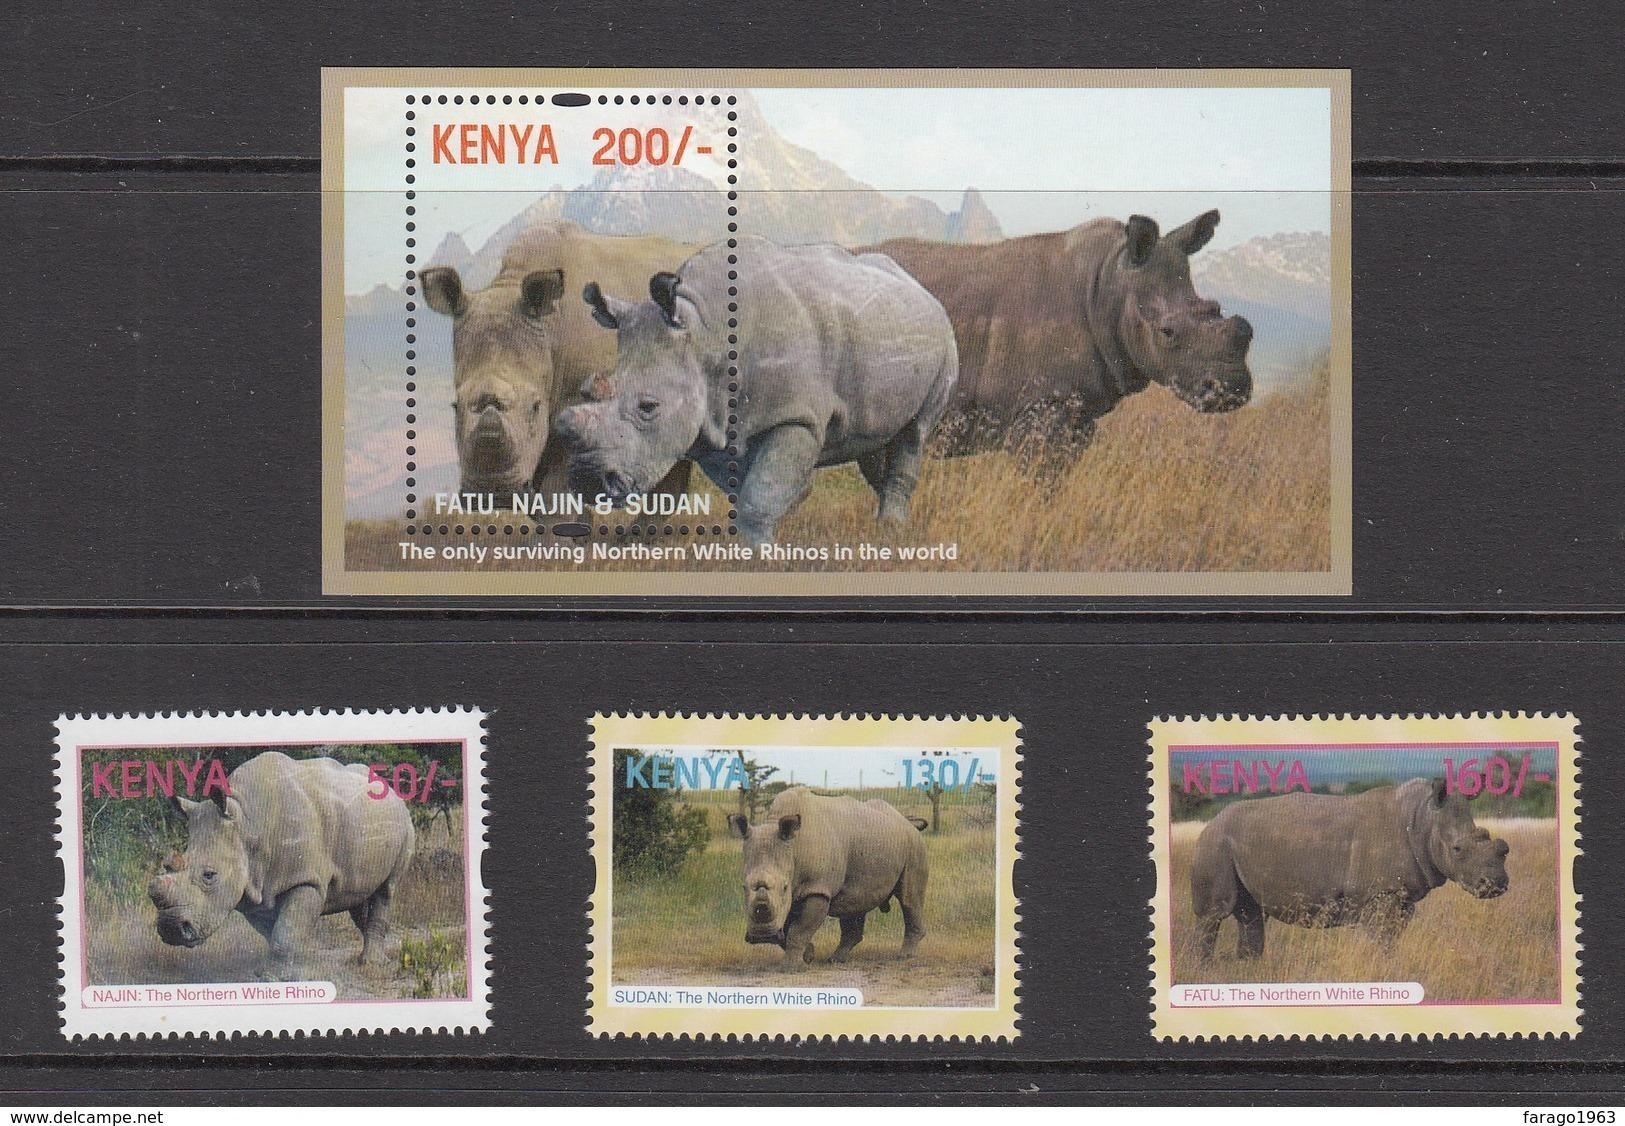 2018 Kenya NEW ISSUE 10.5.18 Northern White Rhino Complete Set Of 3 + Souvenir Sheet MNH - Kenya (1963-...)